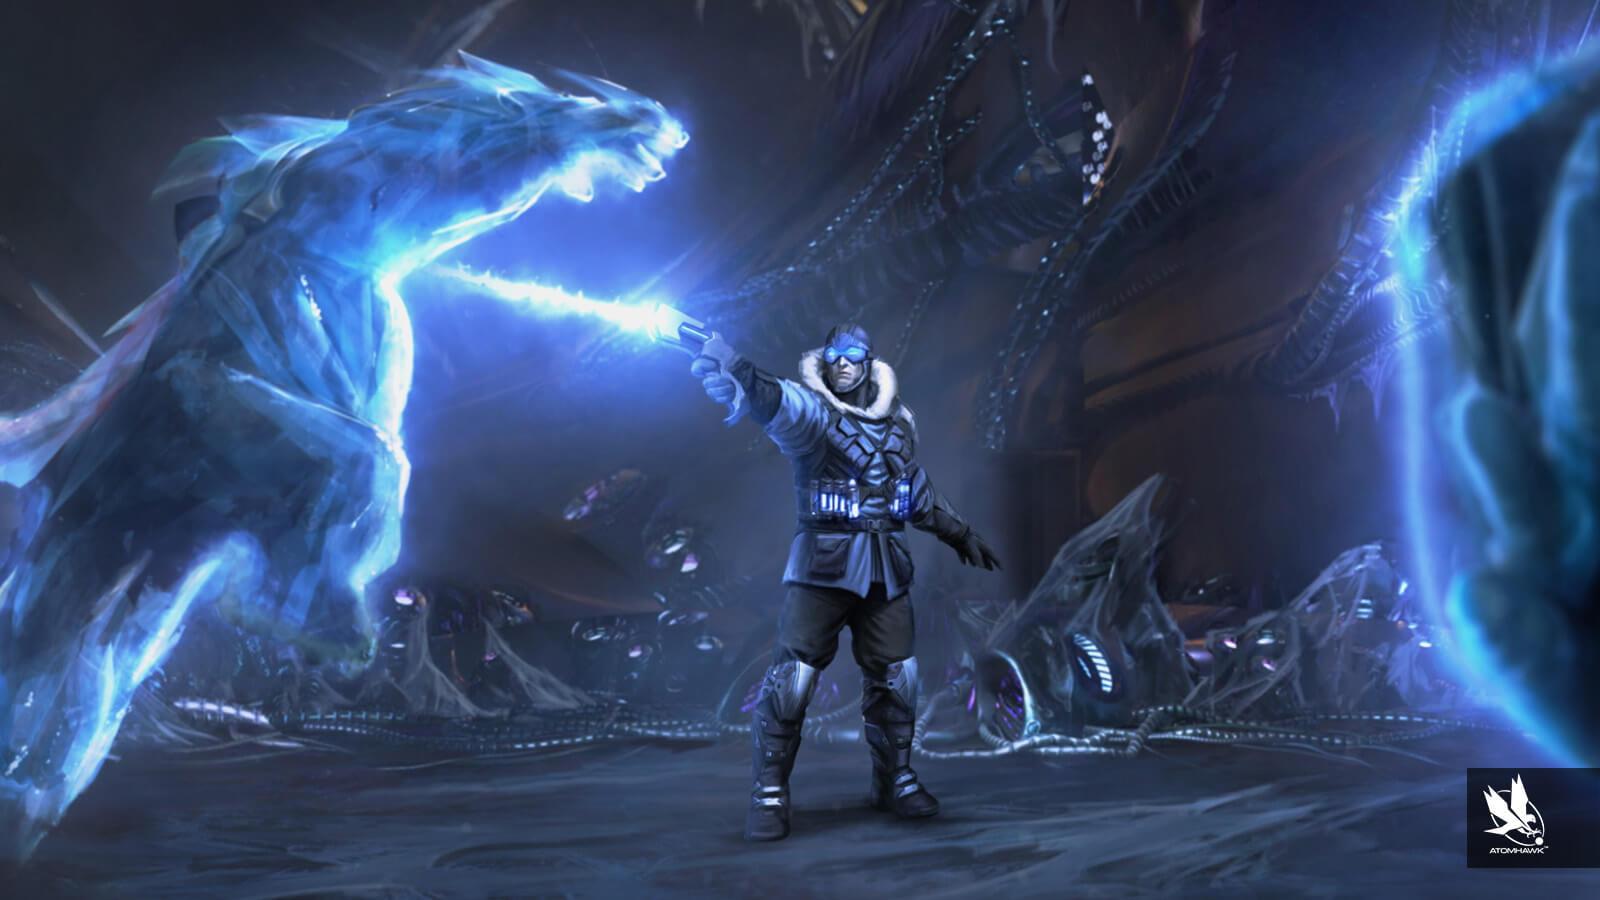 Atomhawk_Warner-Bros-NetherRealm_Injustice-2_Motion-Graphics_Character-Endings_Captain-Cold.jpg